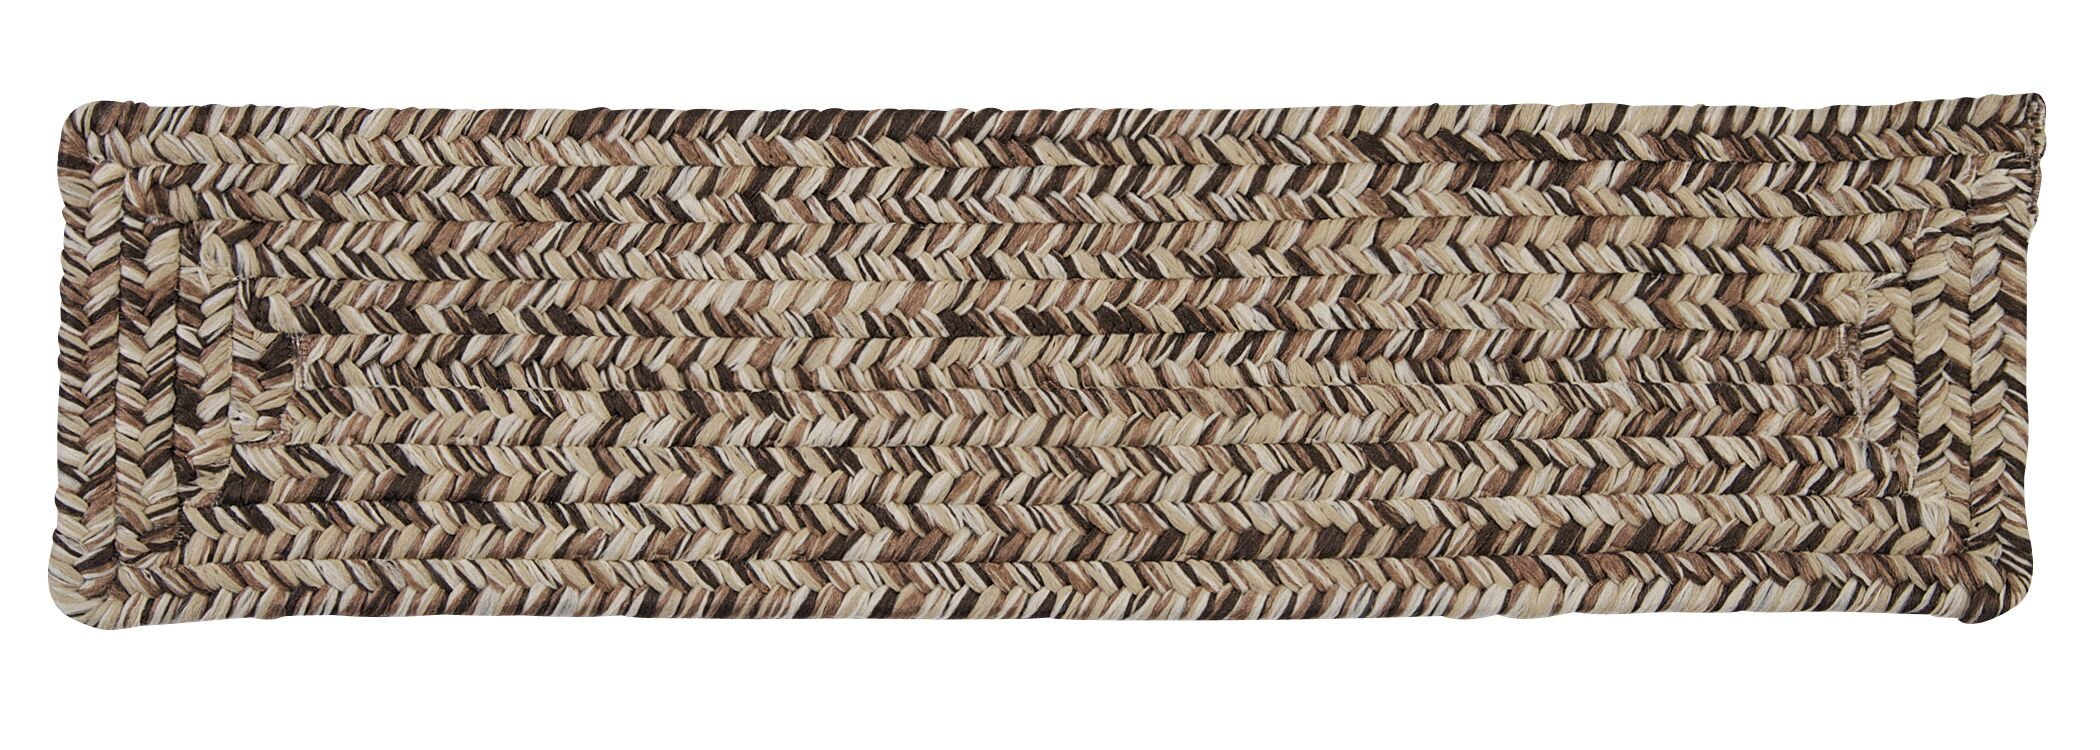 Beltran Weathered Brown Stair Tread Quantity: Set of 13